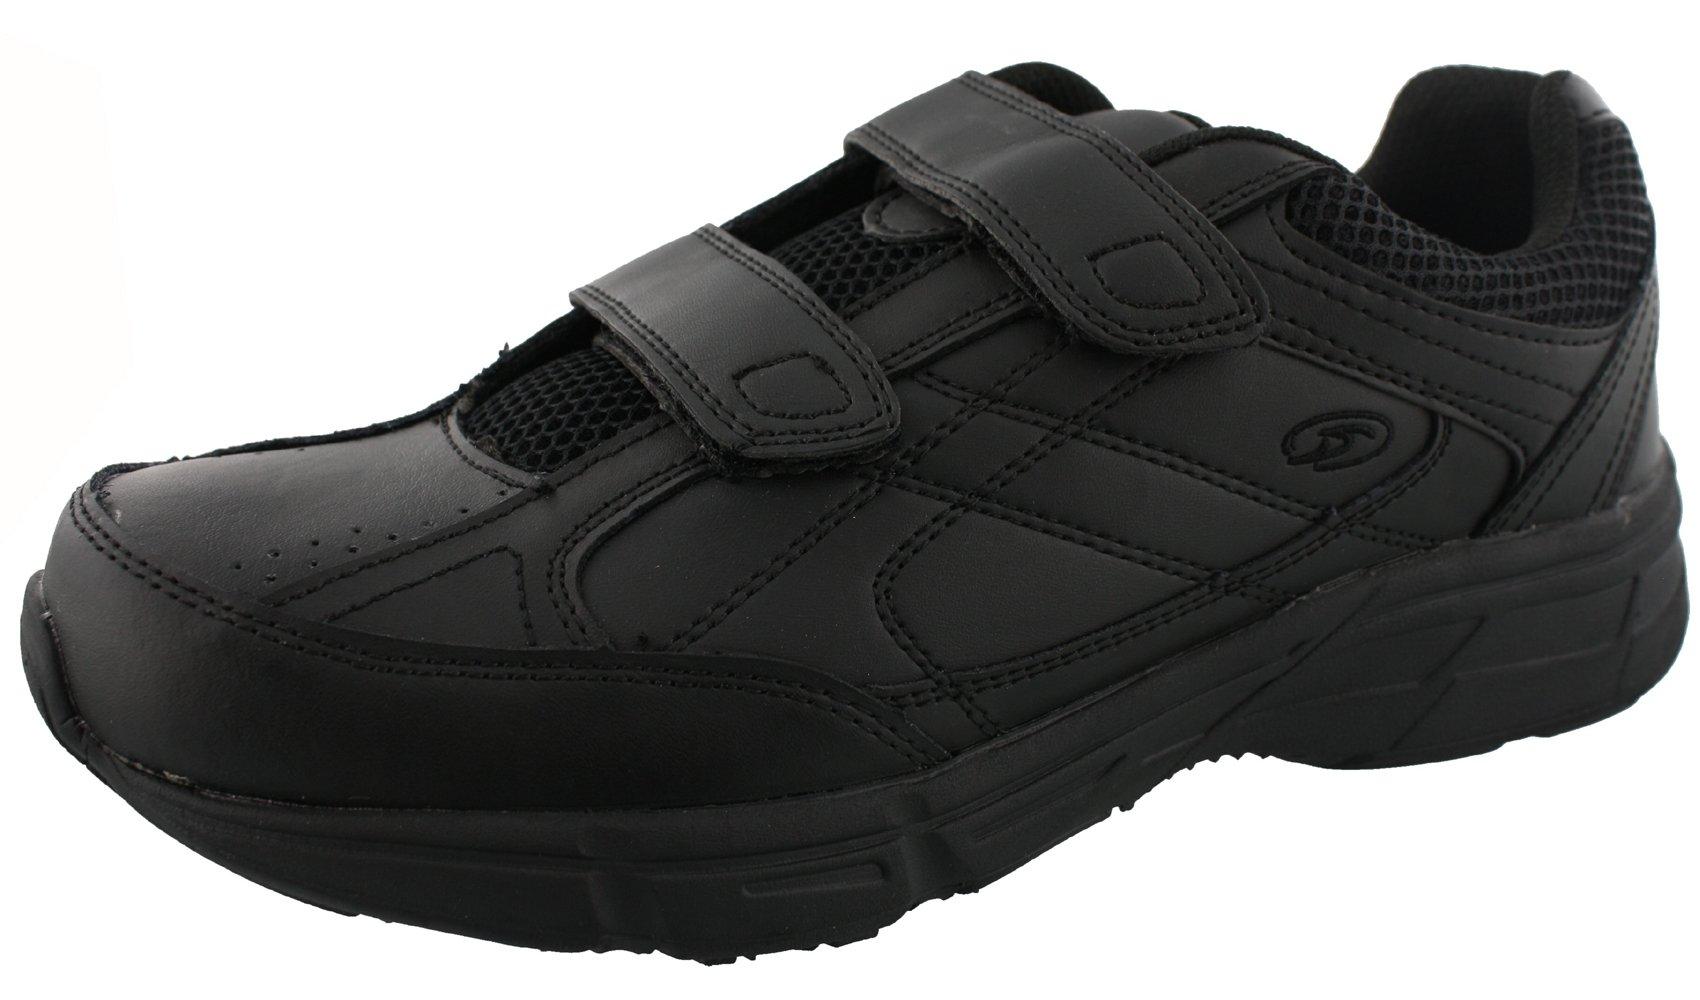 Dr. Scholl's Men's Brisk Light Weight Dual Strap Sneaker, Wide Width (11 Wide, Black) by Dr. Scholl's